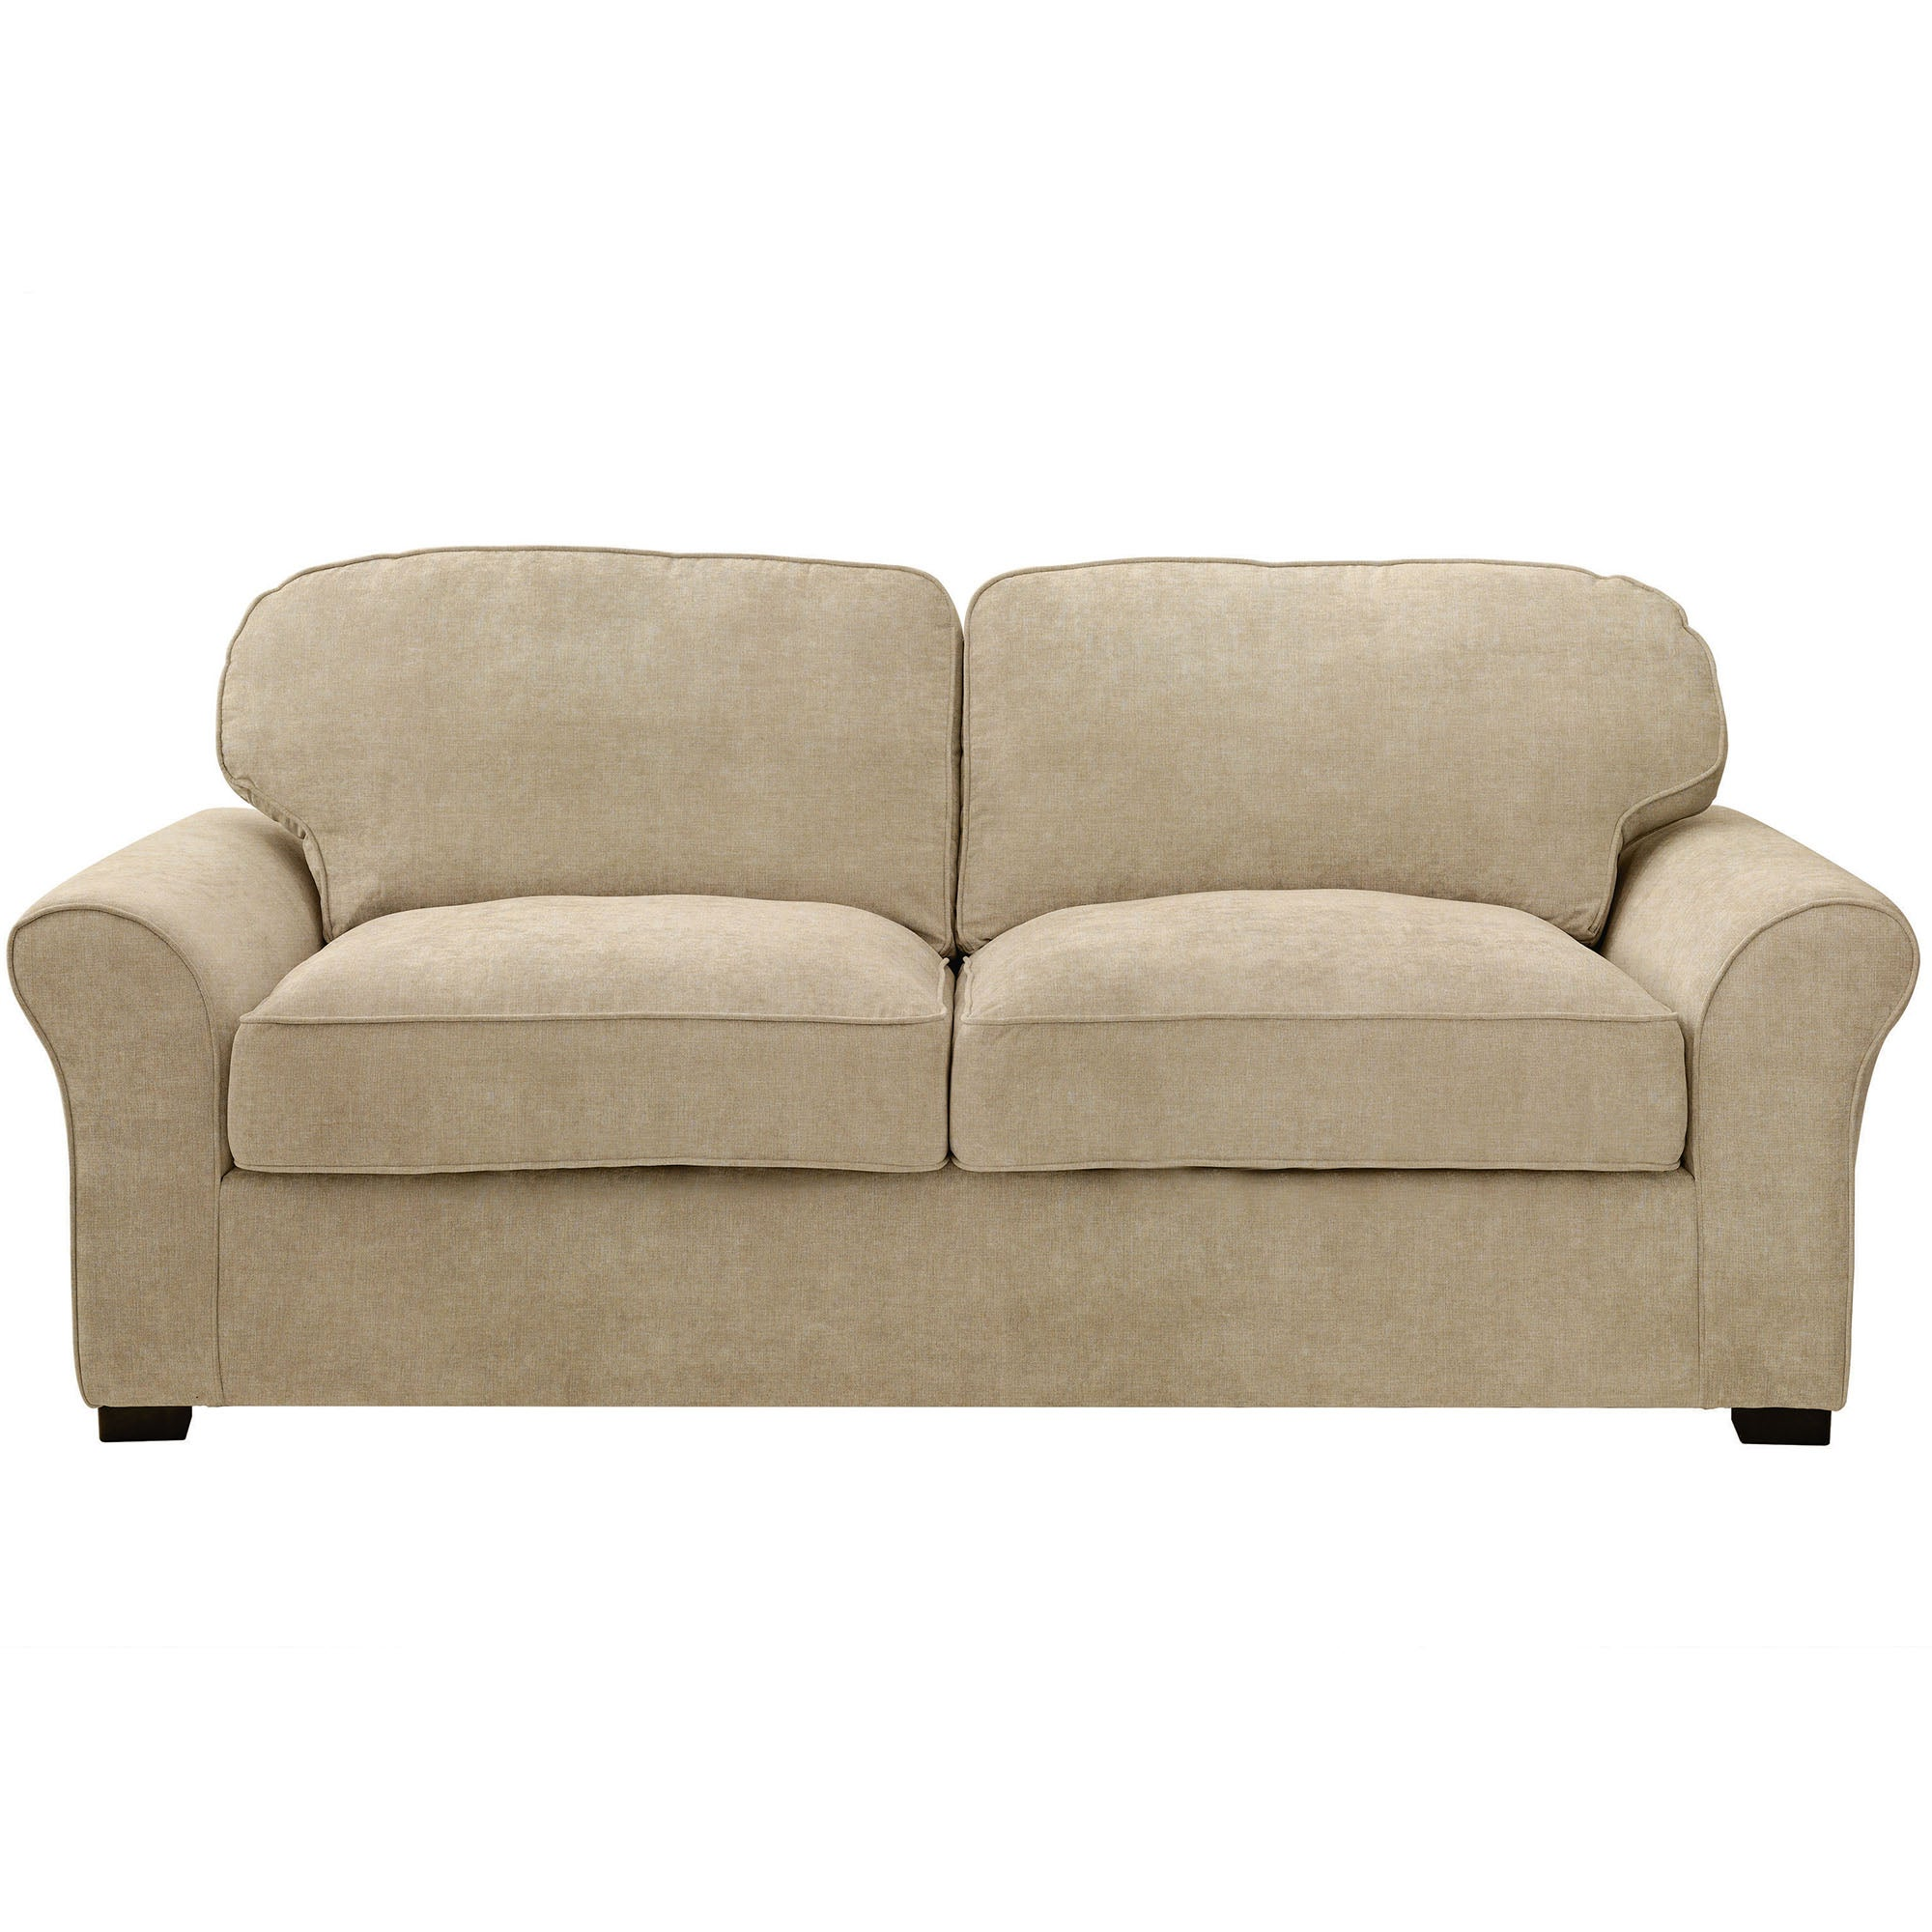 rochester sofa dunelm. Black Bedroom Furniture Sets. Home Design Ideas